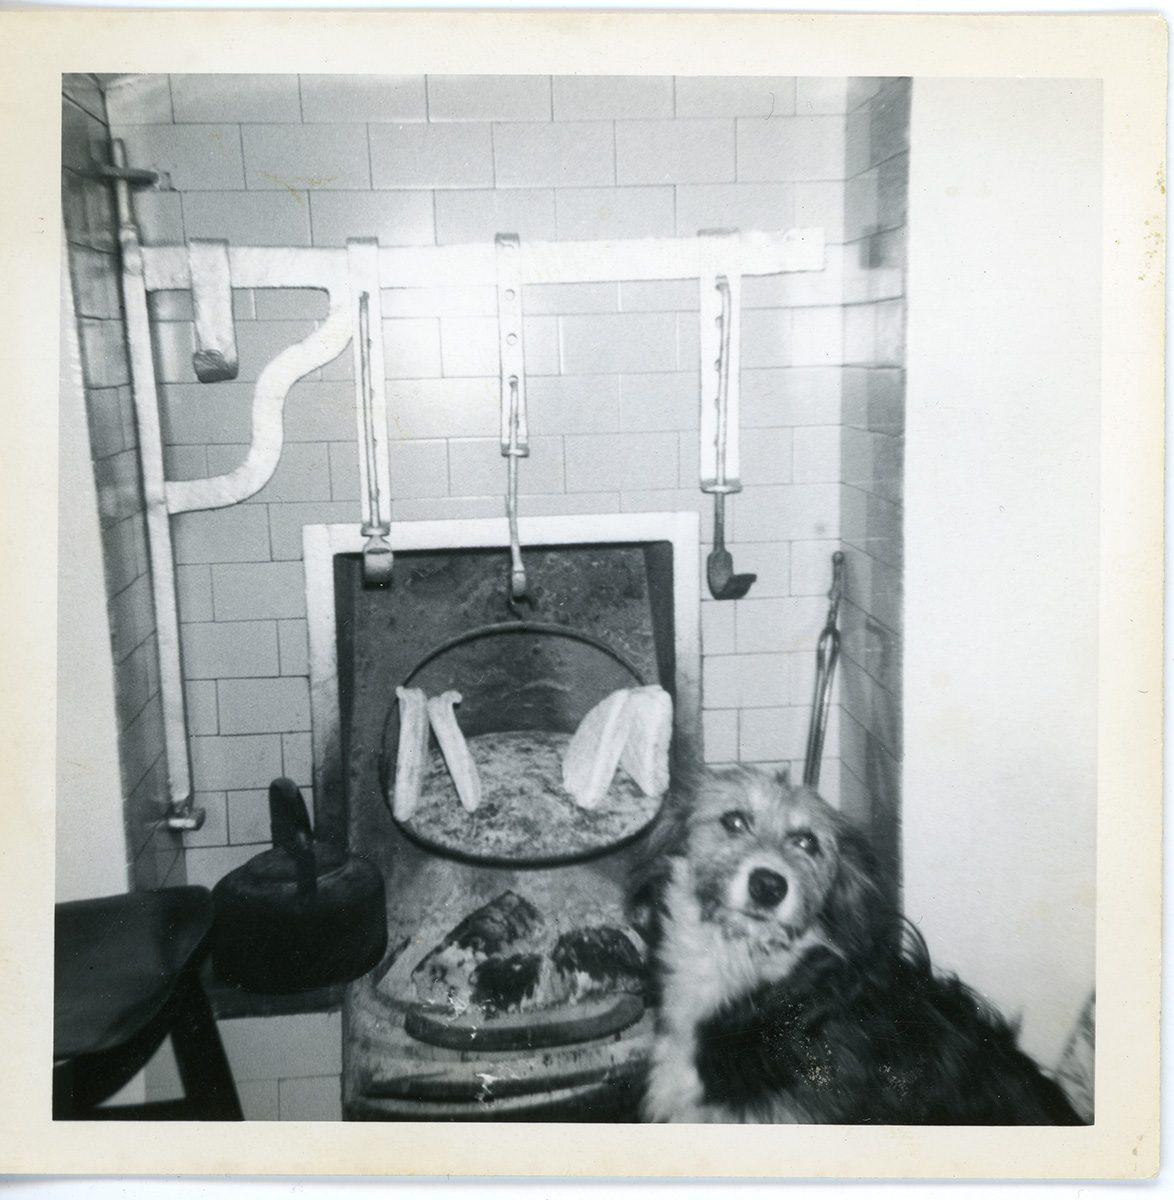 McNally // Boston & Lurgan :: Lassie at the hearth eyeing the soda bread in Kate McConville's kitchen, Derrycor, Craigavon, N.Ireland. About 1963